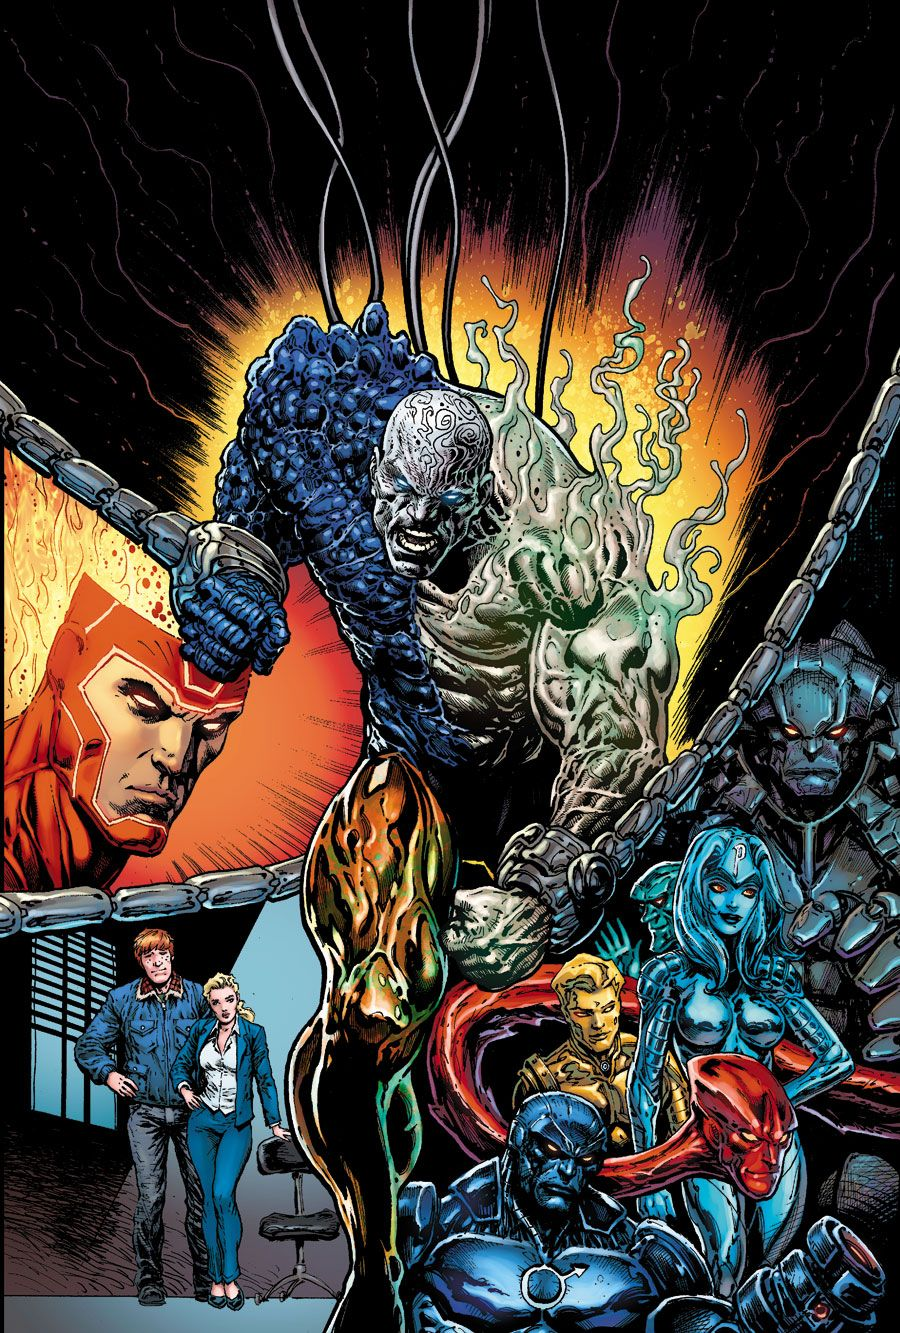 Quot Justice League Quot Turns 50 In Dc Comics April 2016